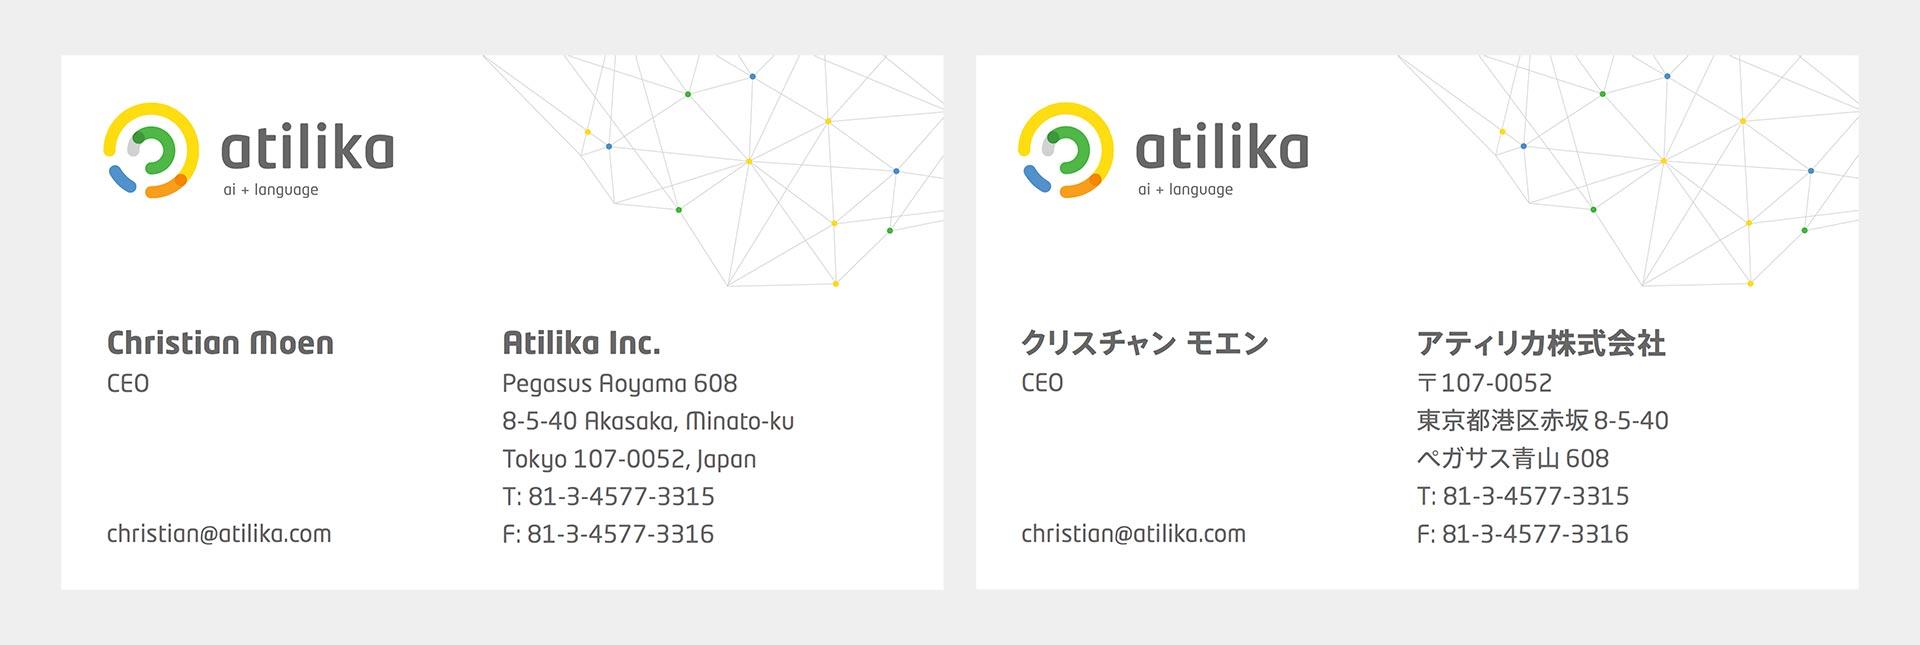 Atilika Tokyo Japan - ai artificial intelligence & language processing - Business Card Template